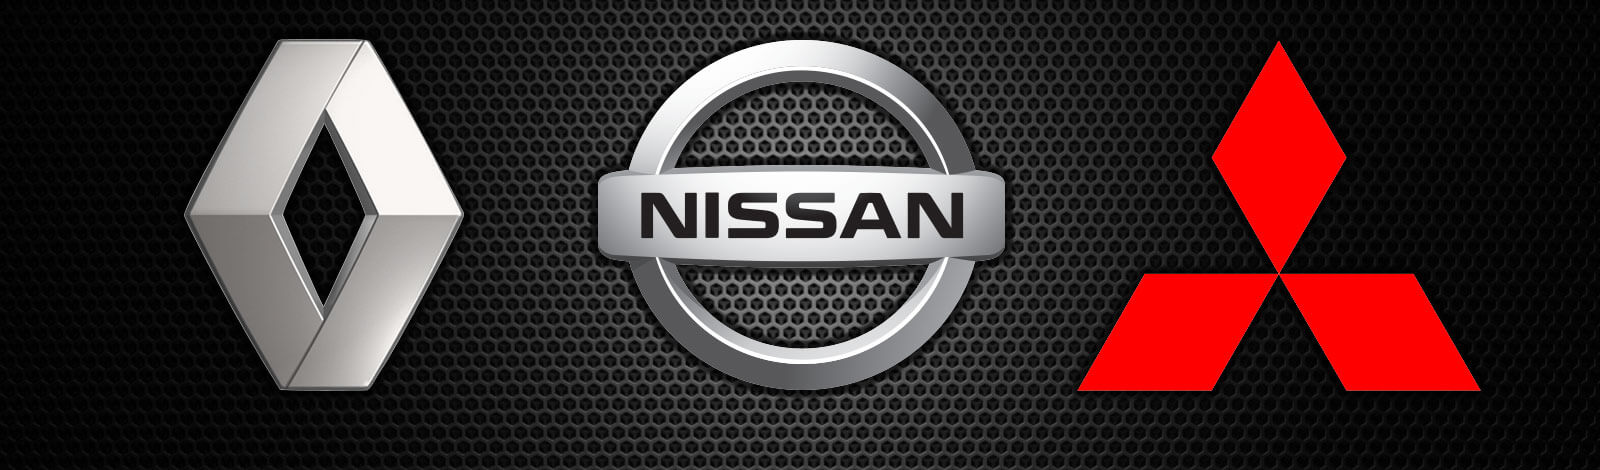 renault nissan case study essays